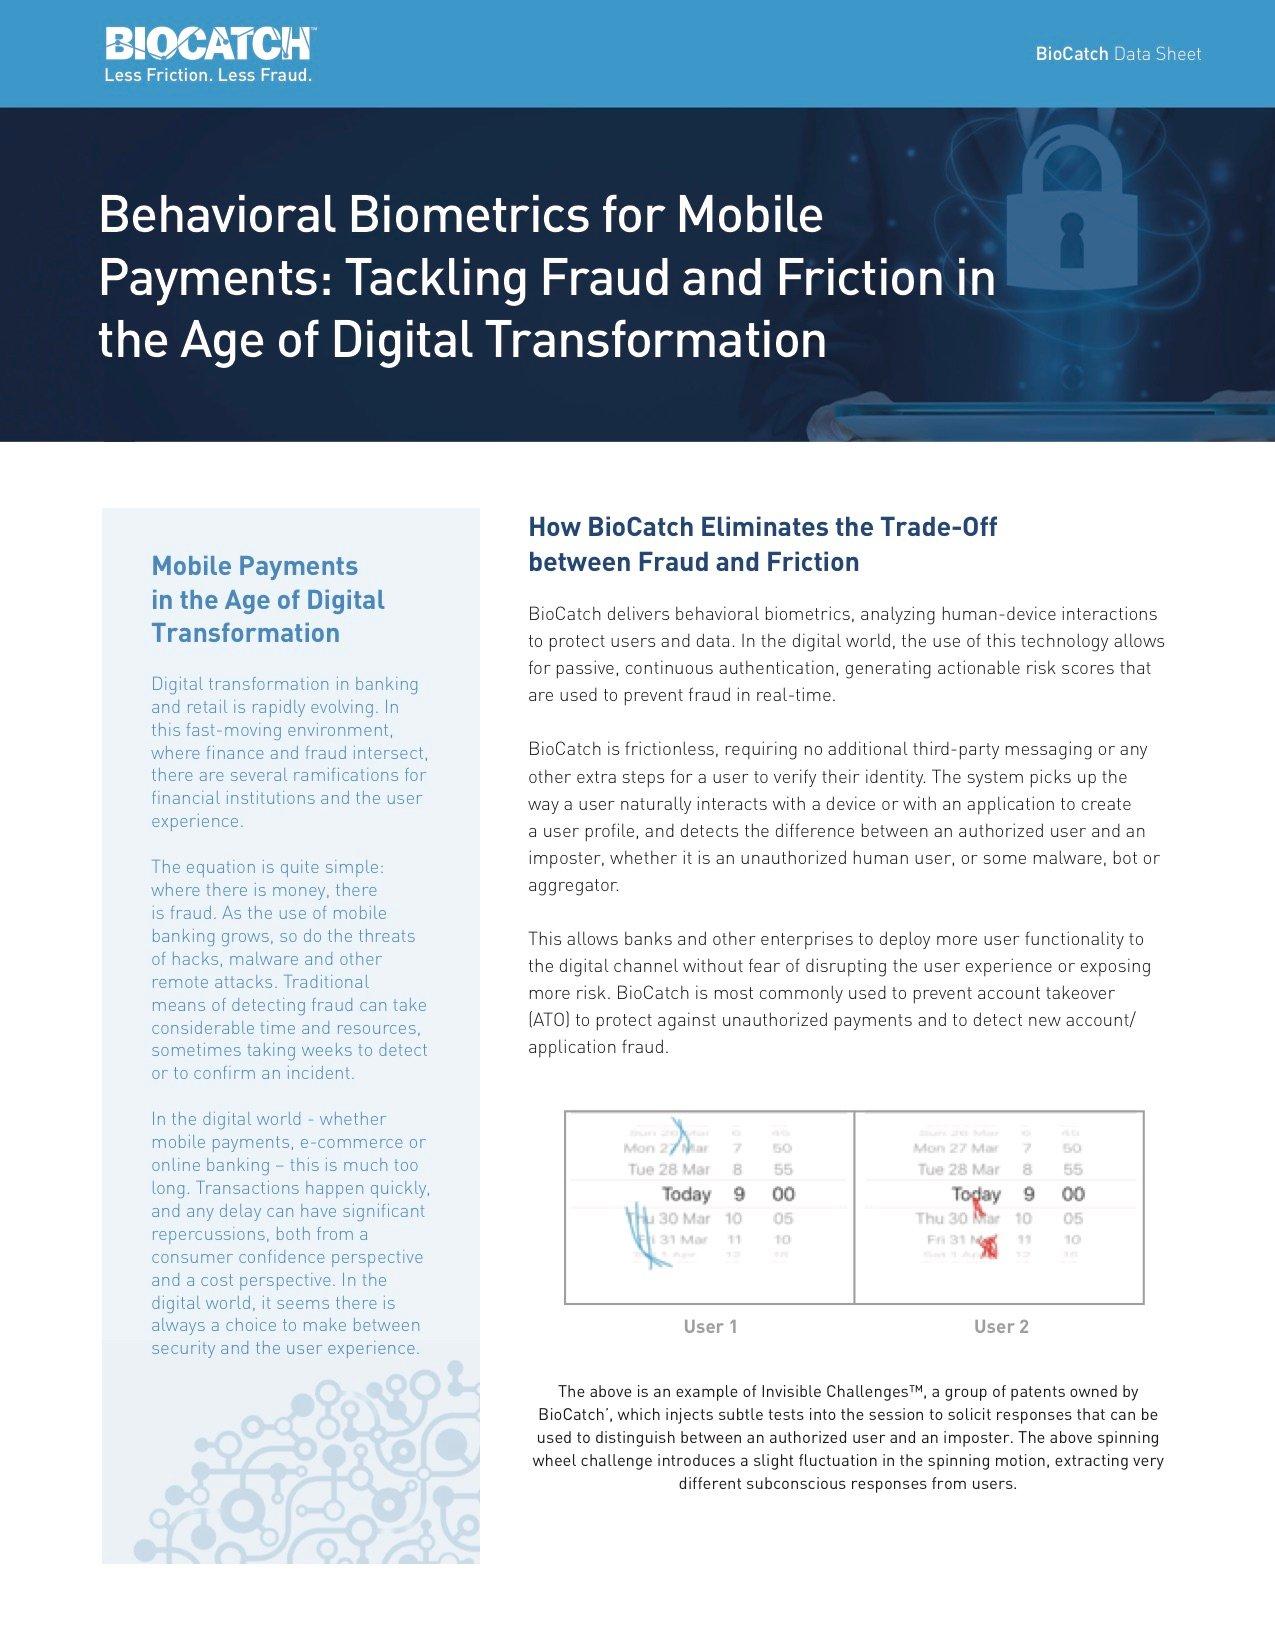 Behavioral Biometrics for Mobile Payments-1.jpg